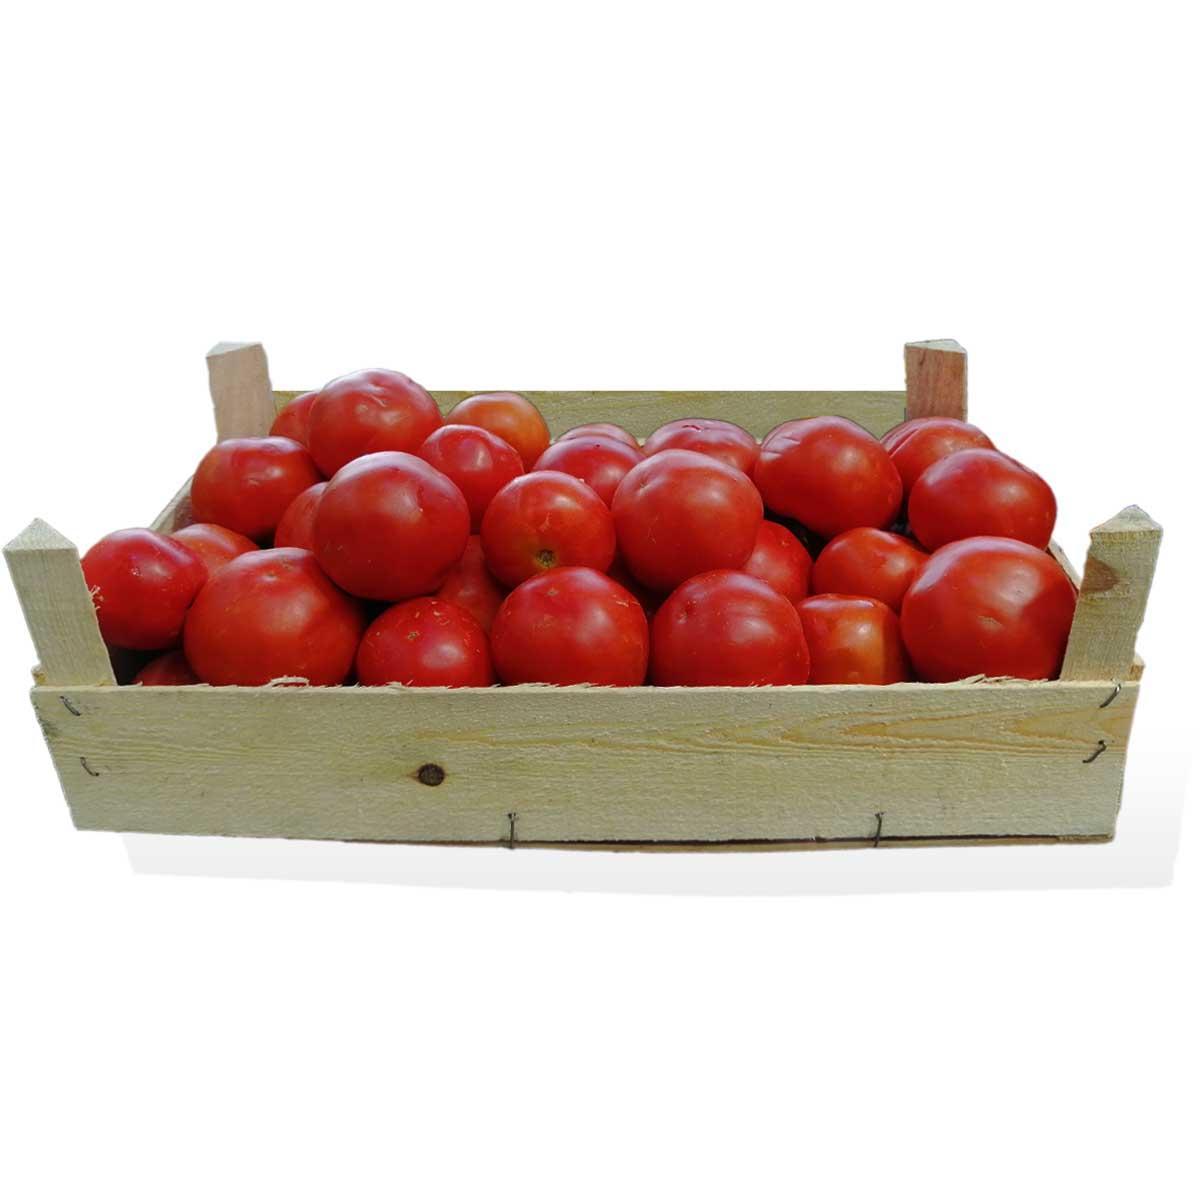 Tomato Jordan - Box